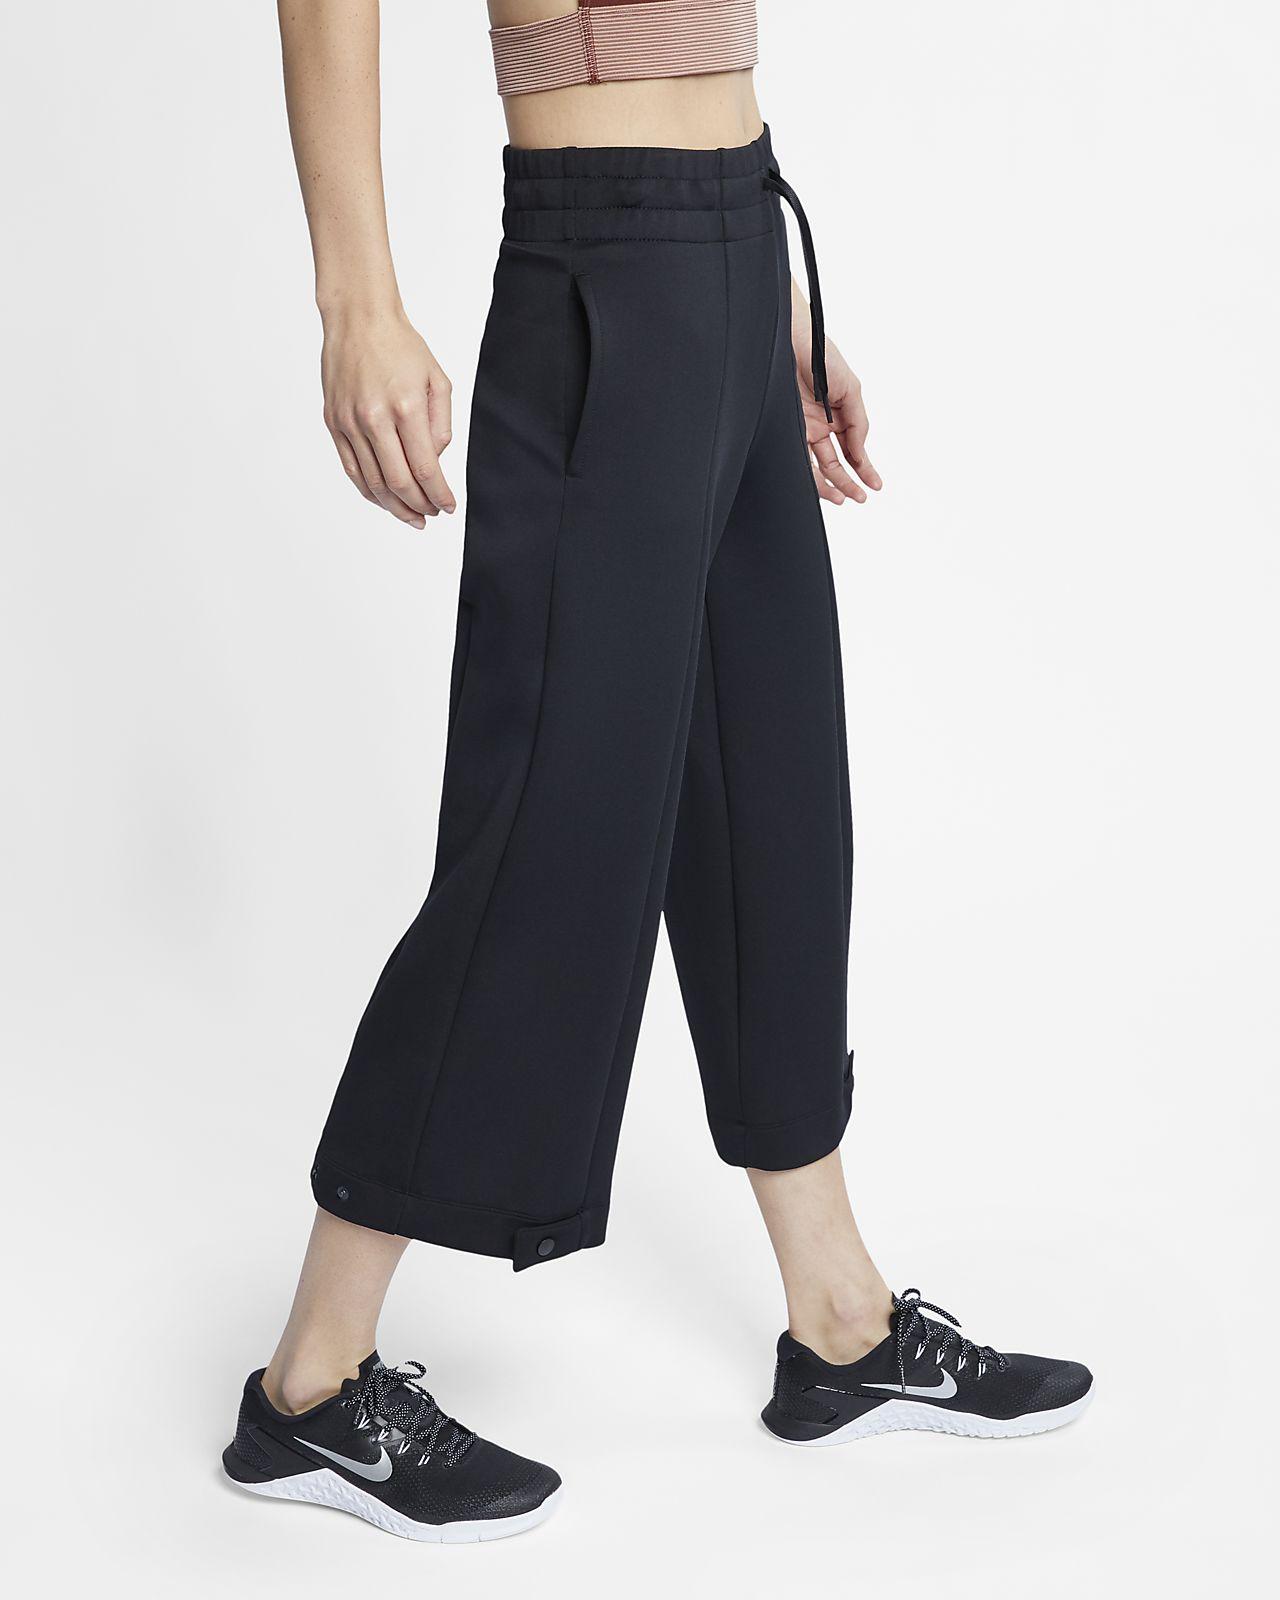 Training Fit Nike Pour De Femme Dri Pantalon rCodWxeB